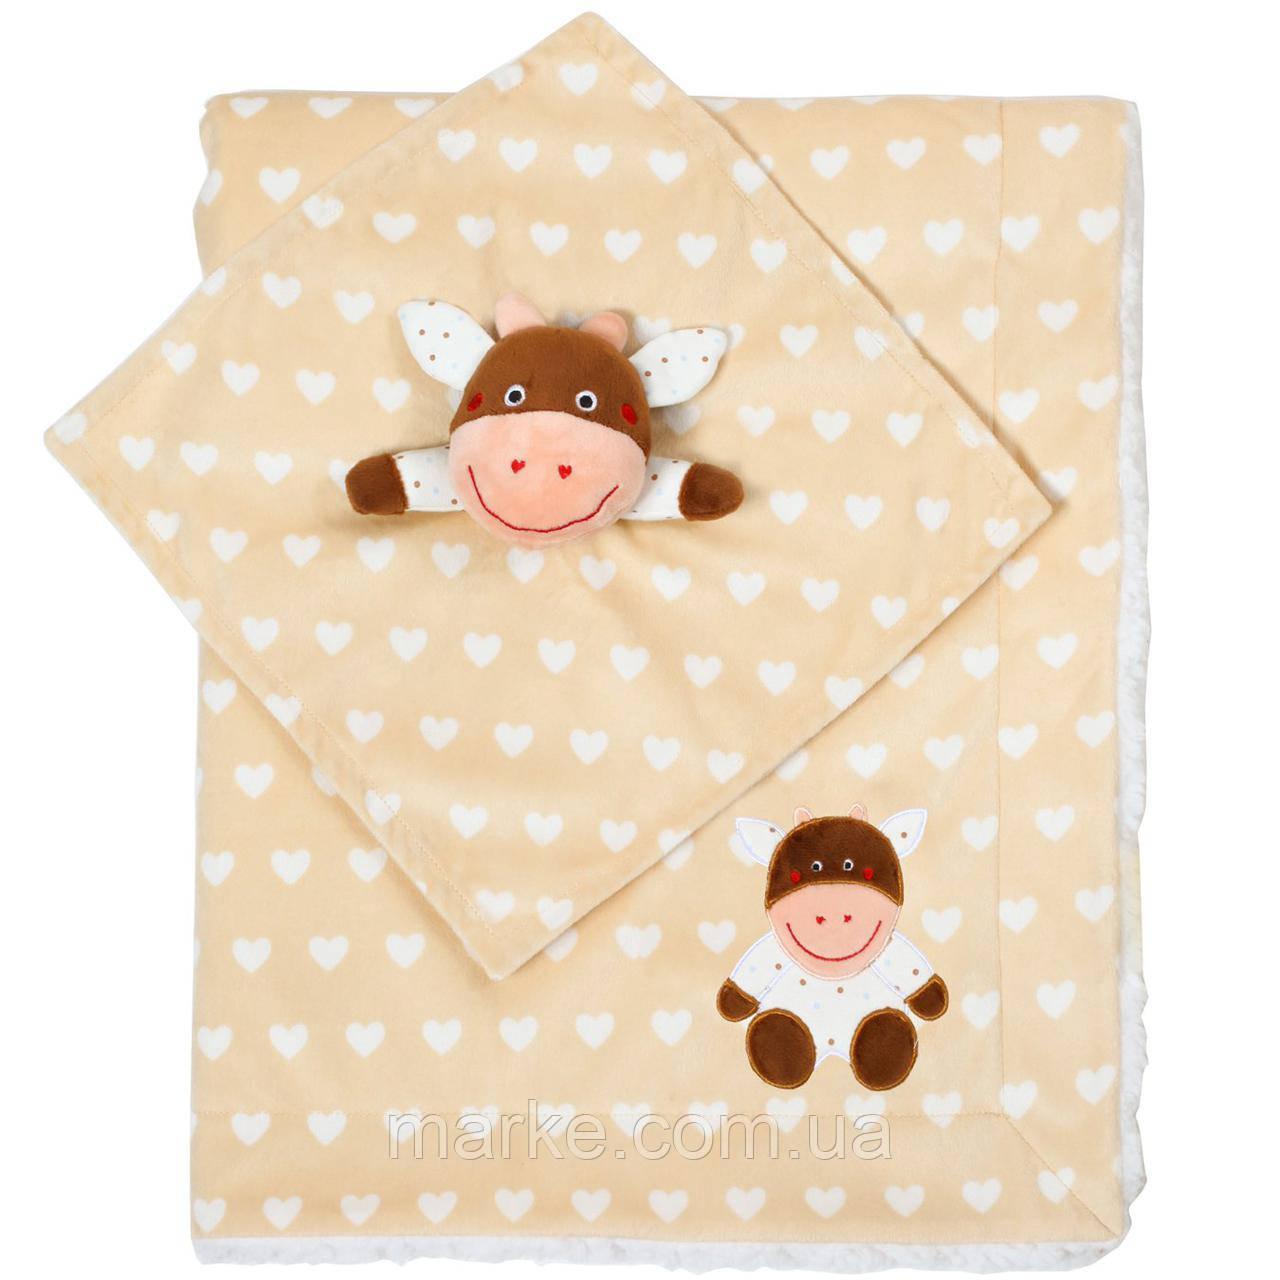 Двухстороннее одеяло BabyOno 75х100 см Minky Коровка (1412/04)